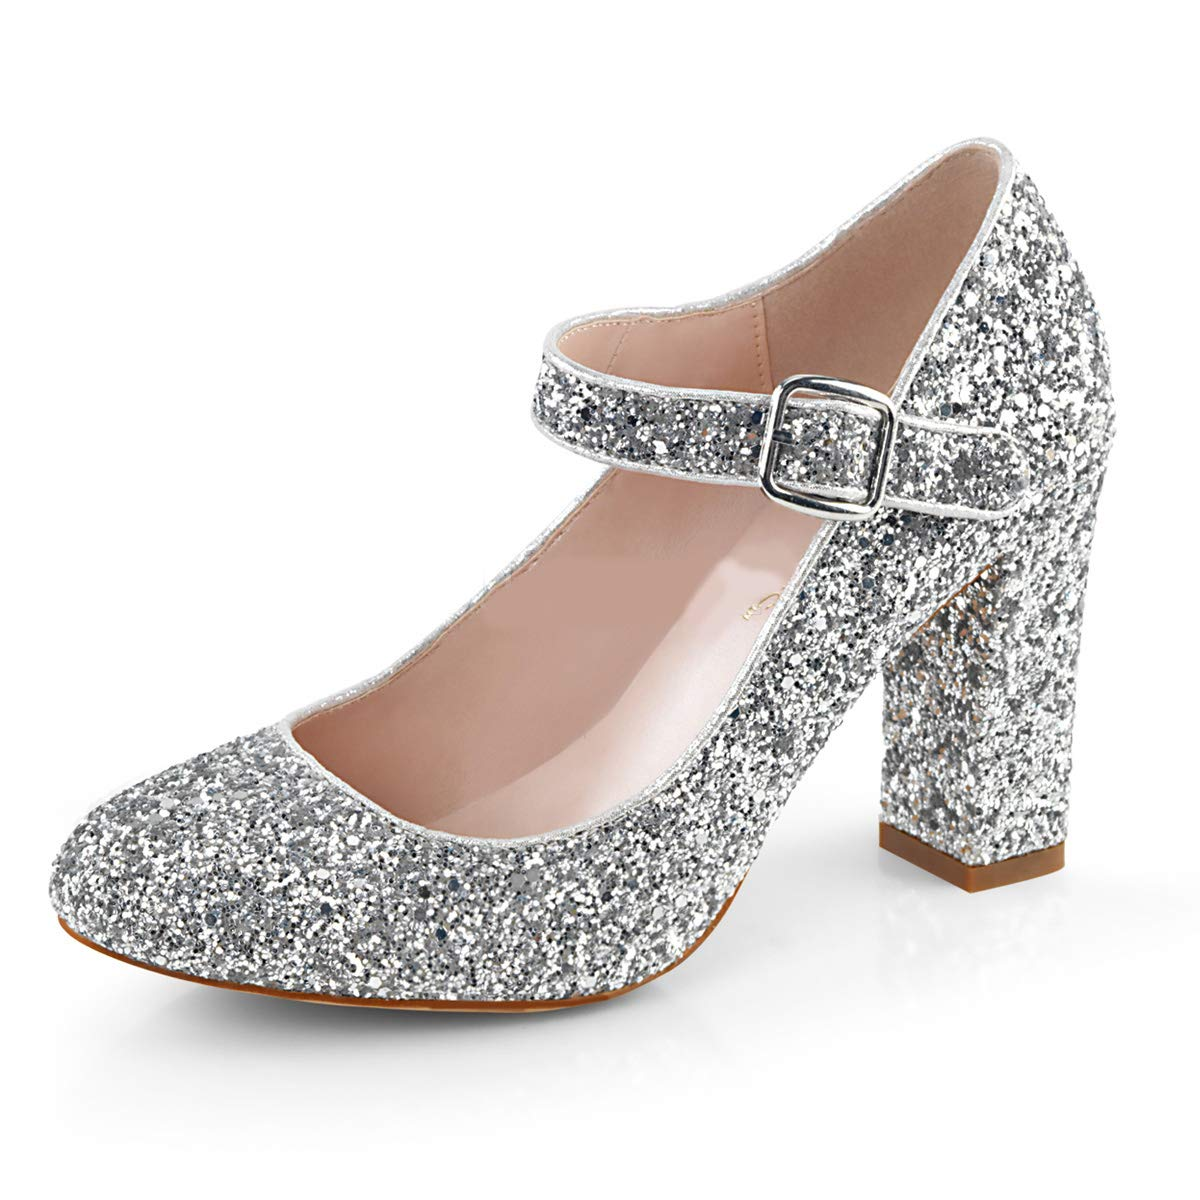 Higher-Heels Fabulicious Damen Glitter Mary Jane Pumps Sabrina-07 Silber Silber Silber Glitter Silber 225112